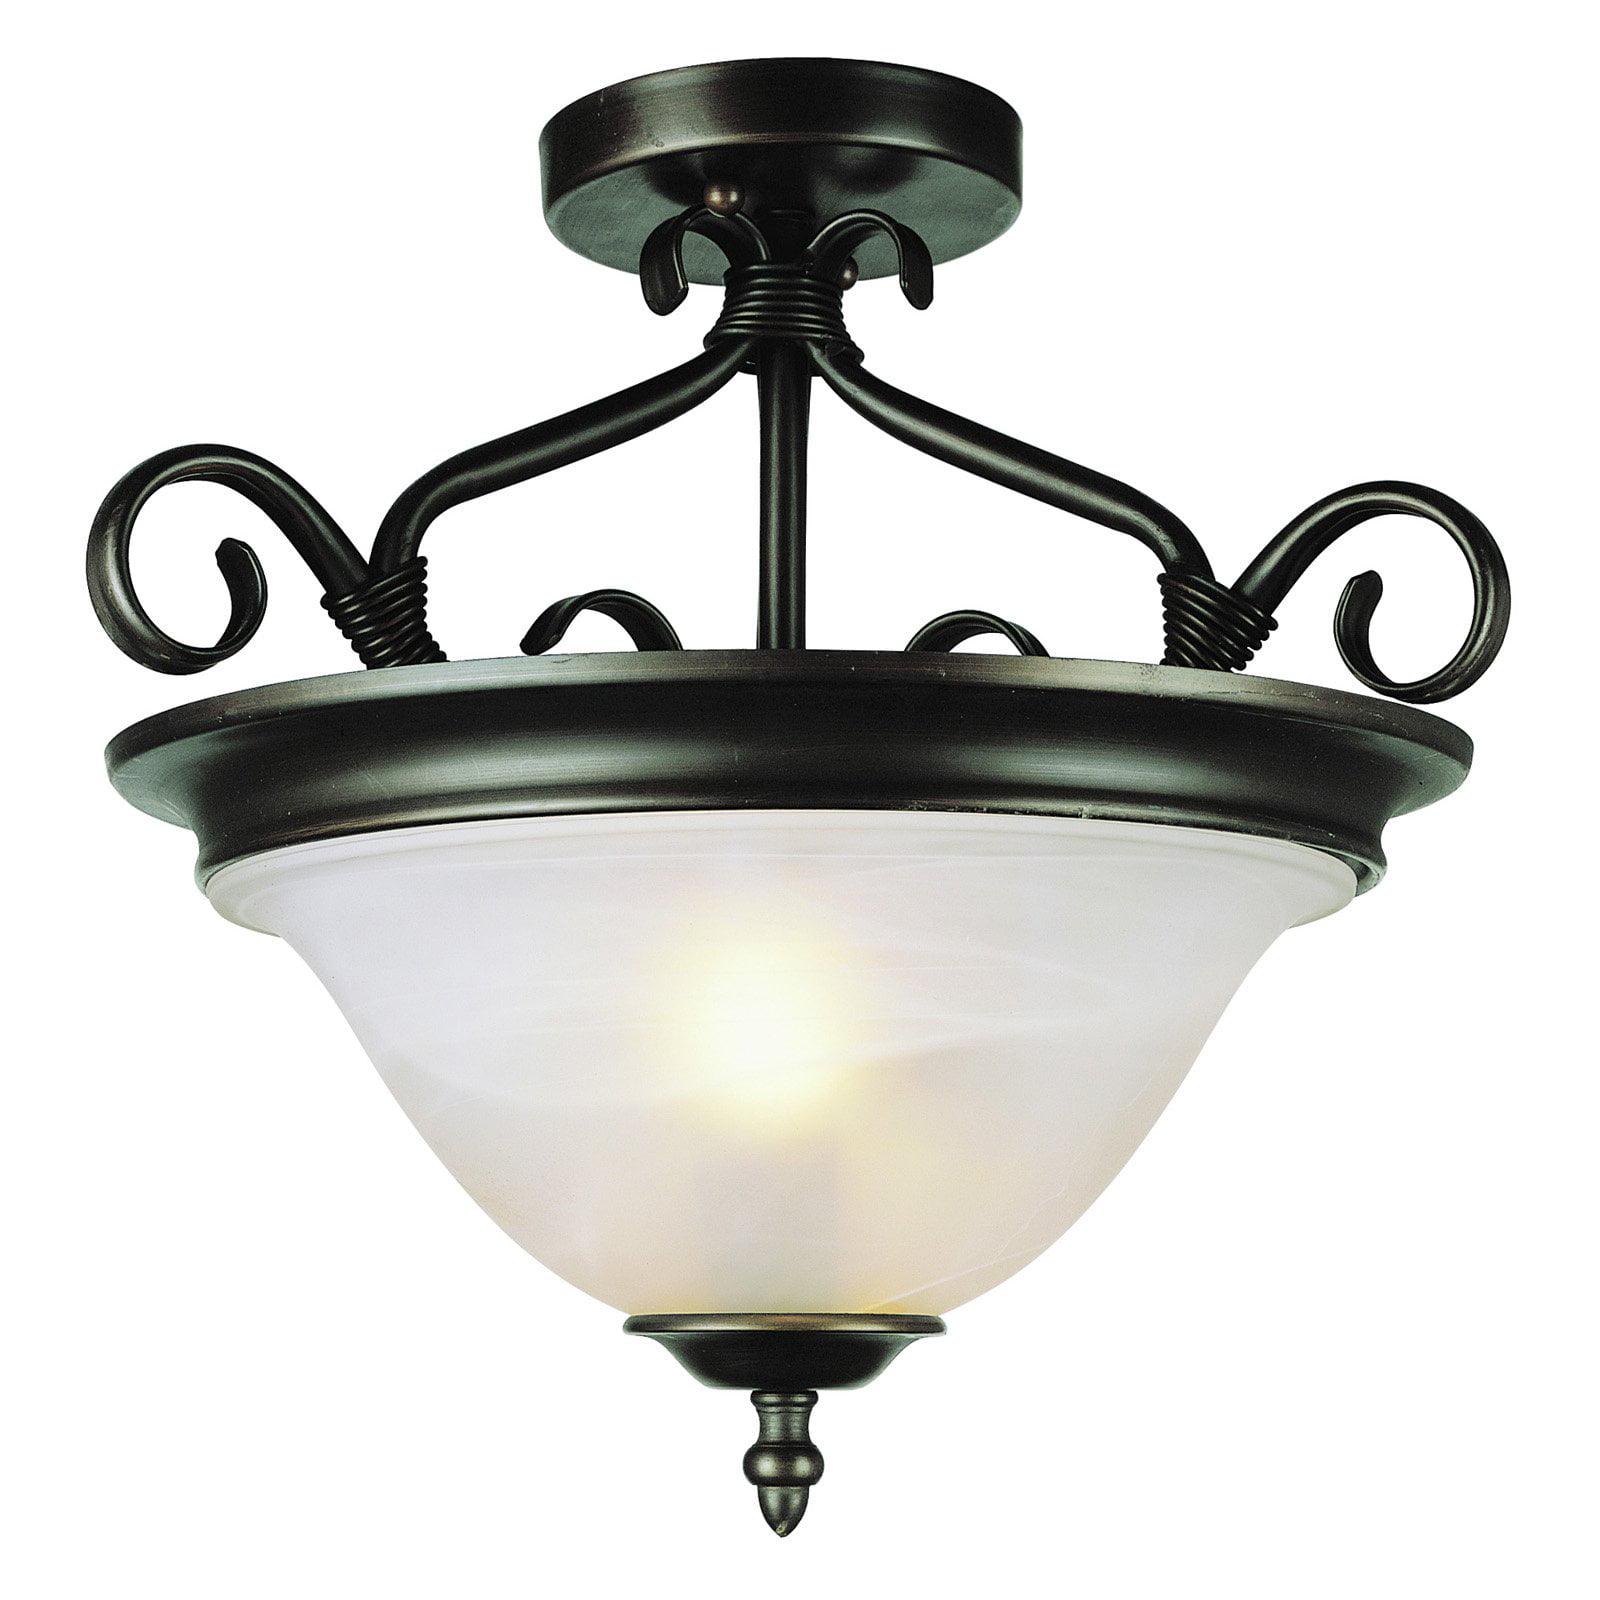 Trans Globe Lighting 6390 ROB New Century 2 Light Rubbed Oil Bronze Ceiling Mount